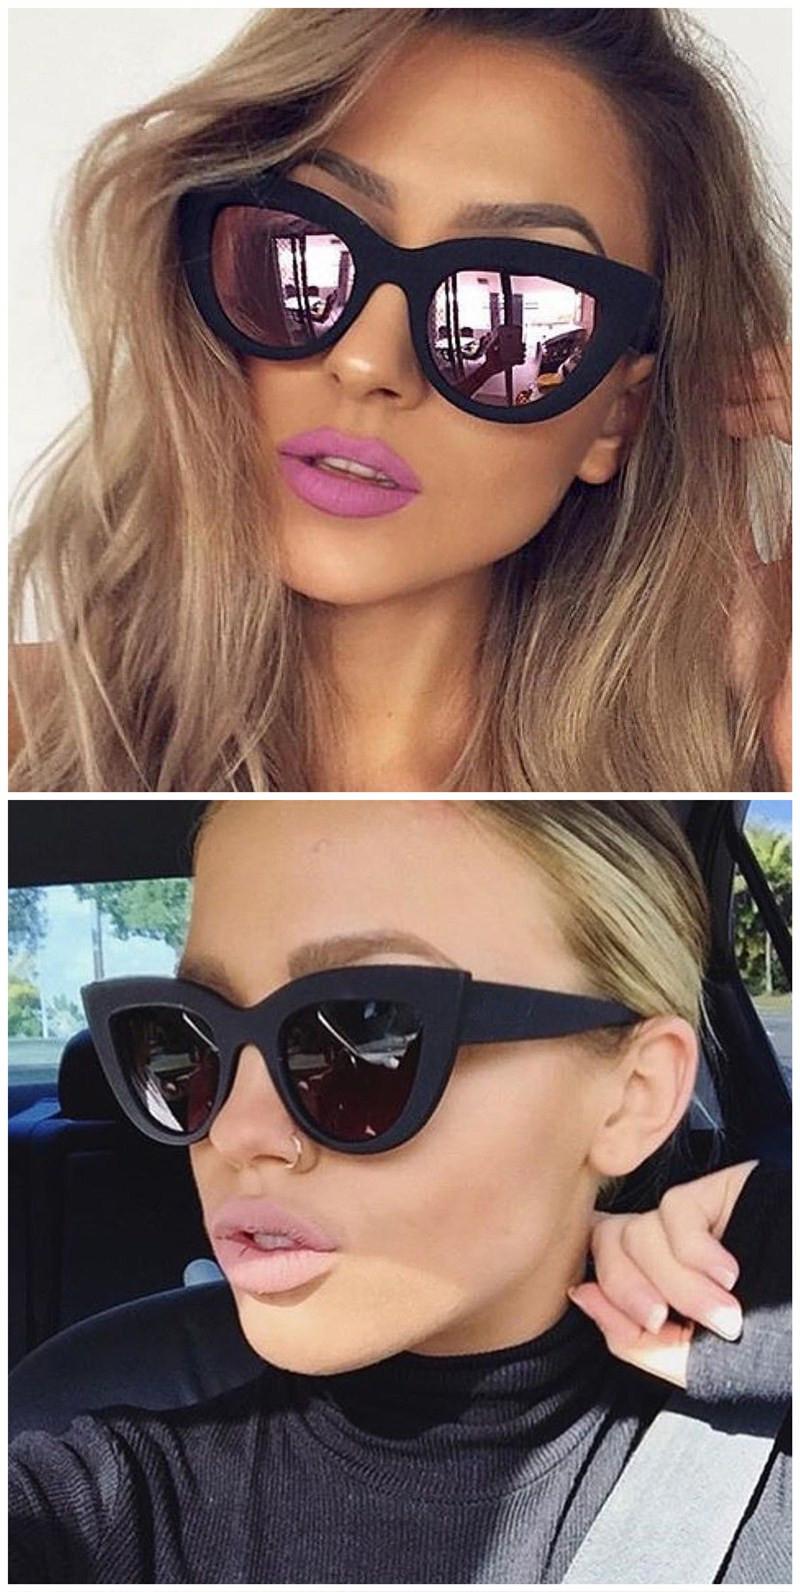 HTB1wr0KRVXXXXcjXVXXq6xXFXXXL - Rose Gold Cat Eye Sunglasses For Women Pink Mirror Shades Female Sun Glasses Black White Coating Cateye Aviation Oculos 2018